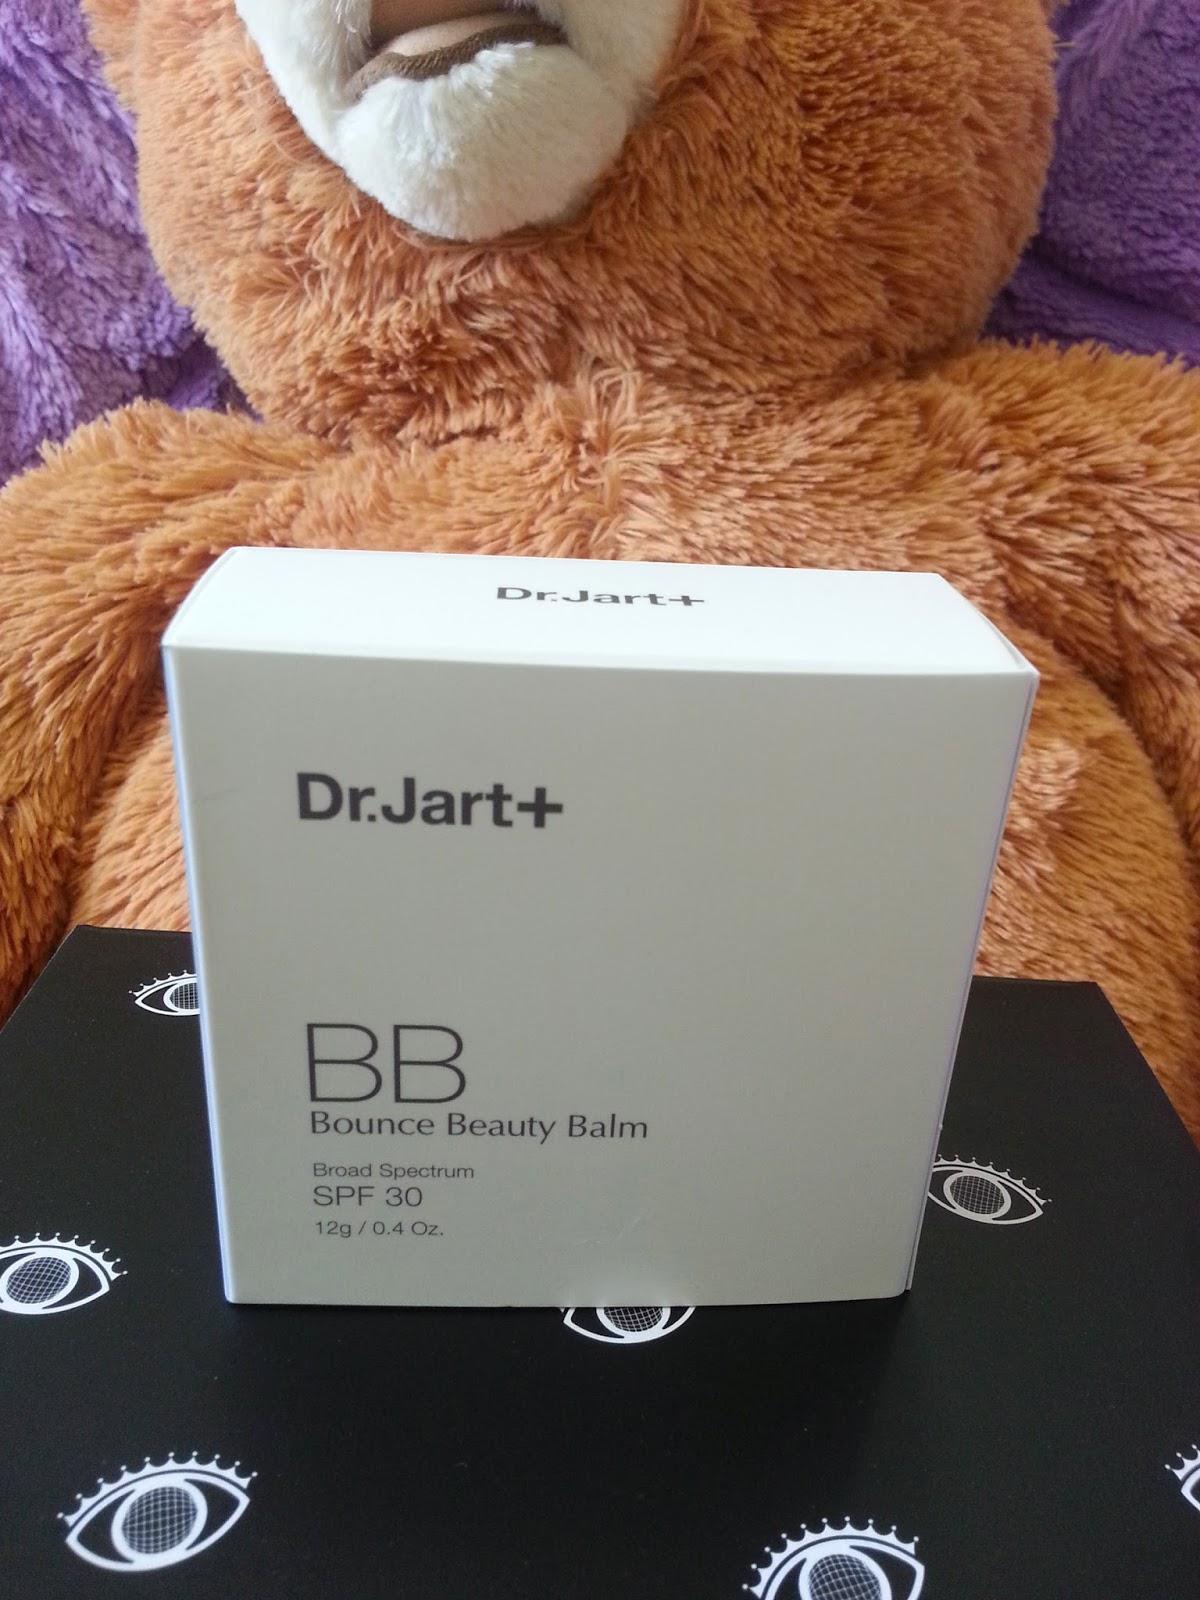 Dr. Jart Bounce Beauty Balm